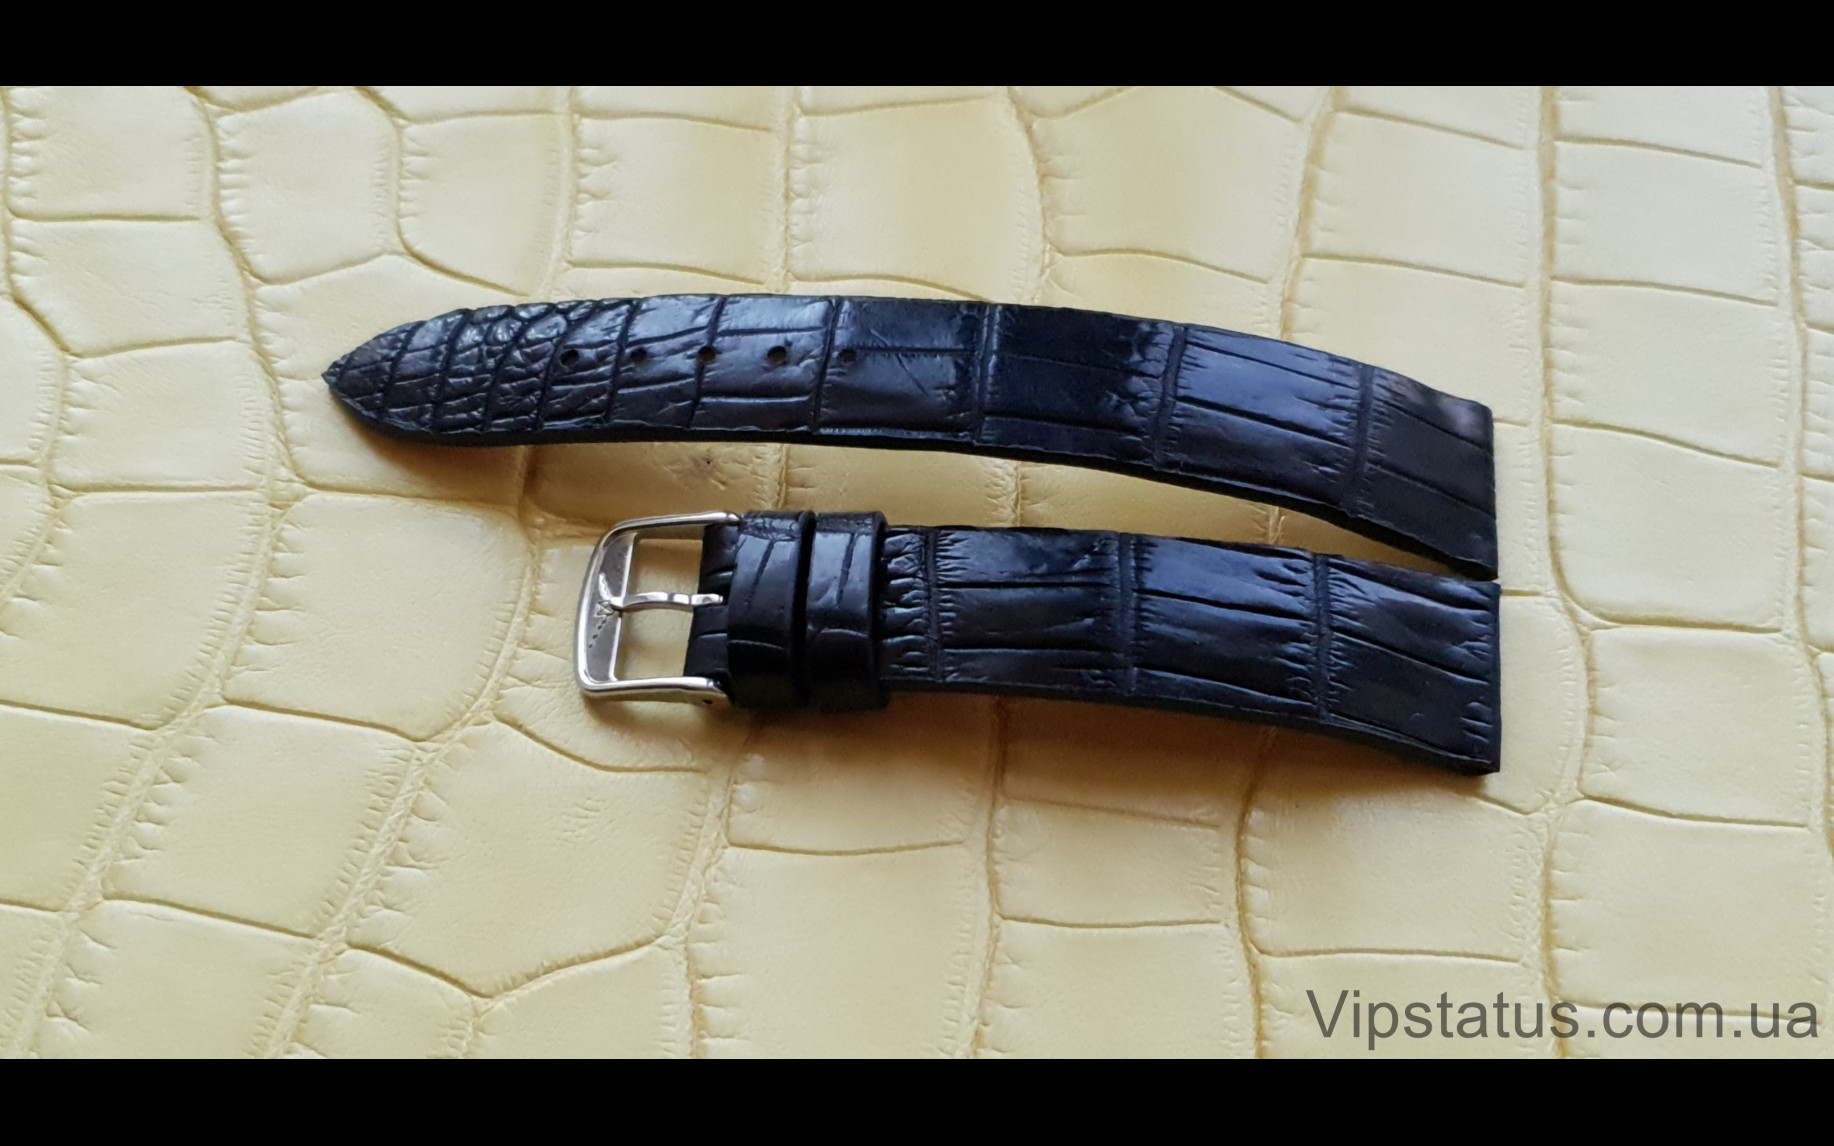 Elite Эксклюзивный ремешок для часов Longines кожа крокодила Exclusive Crocodile Strap for Longines watches image 2